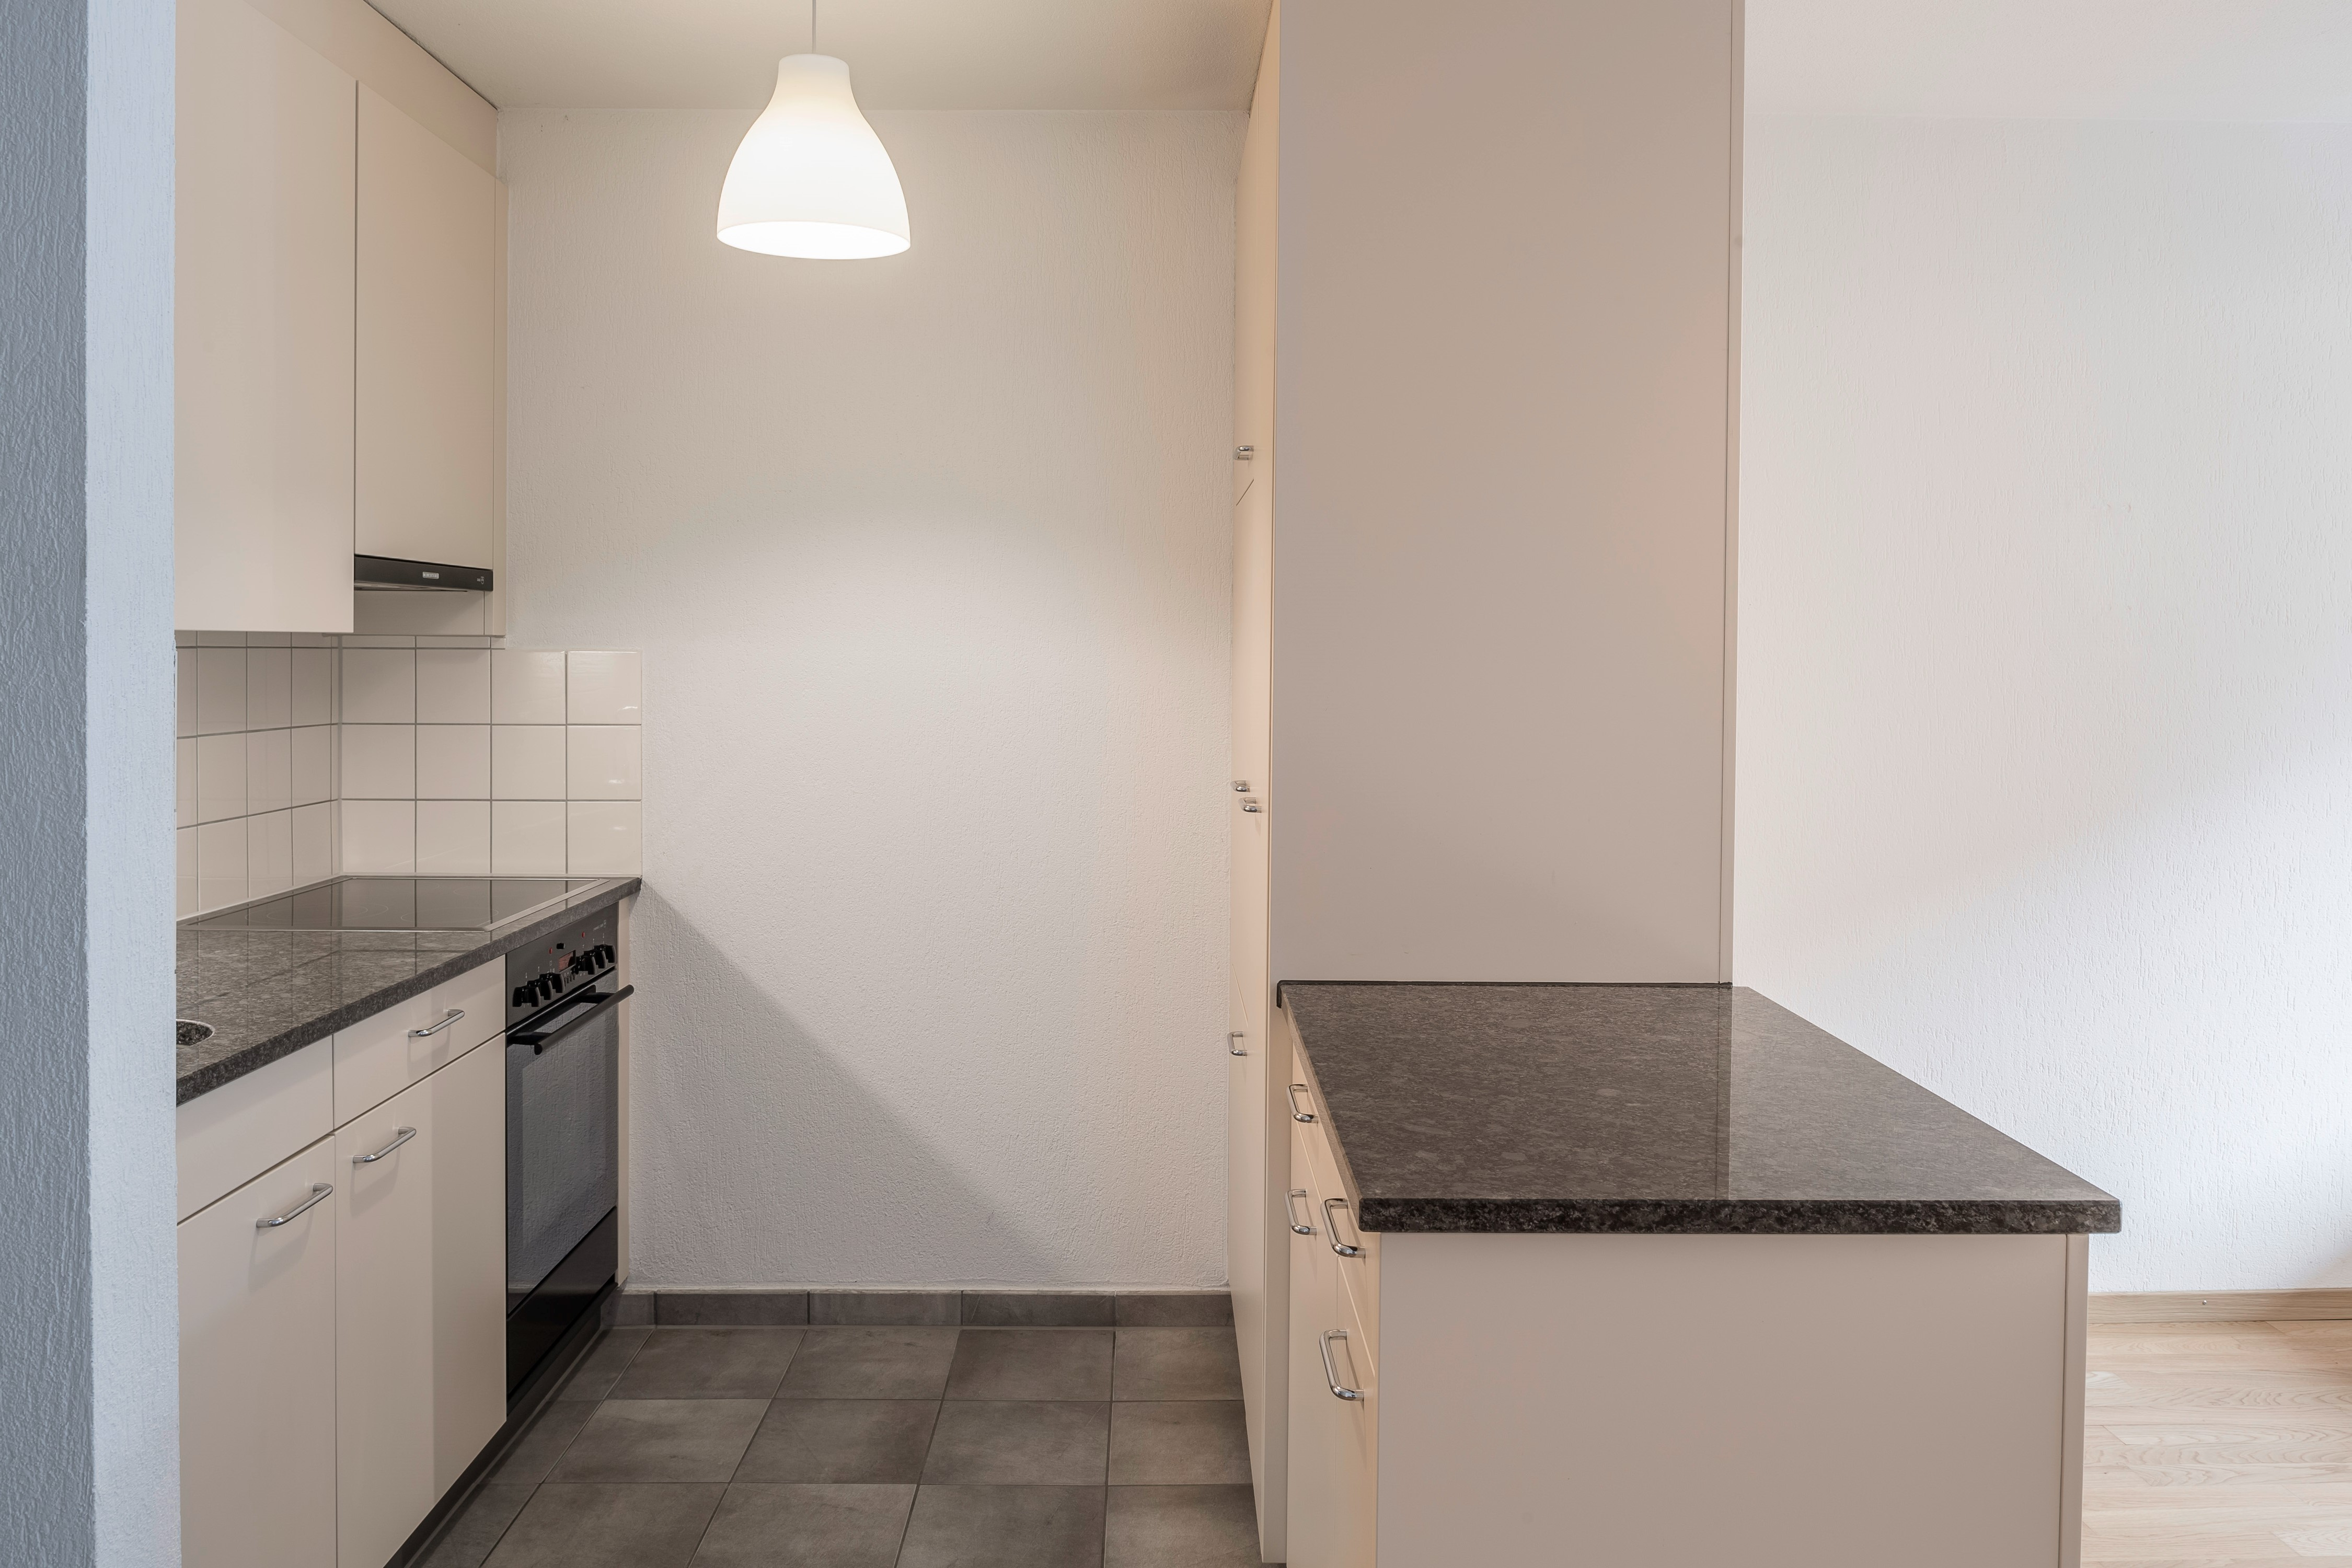 Imfeldstrasse 29, 8037 Zürich